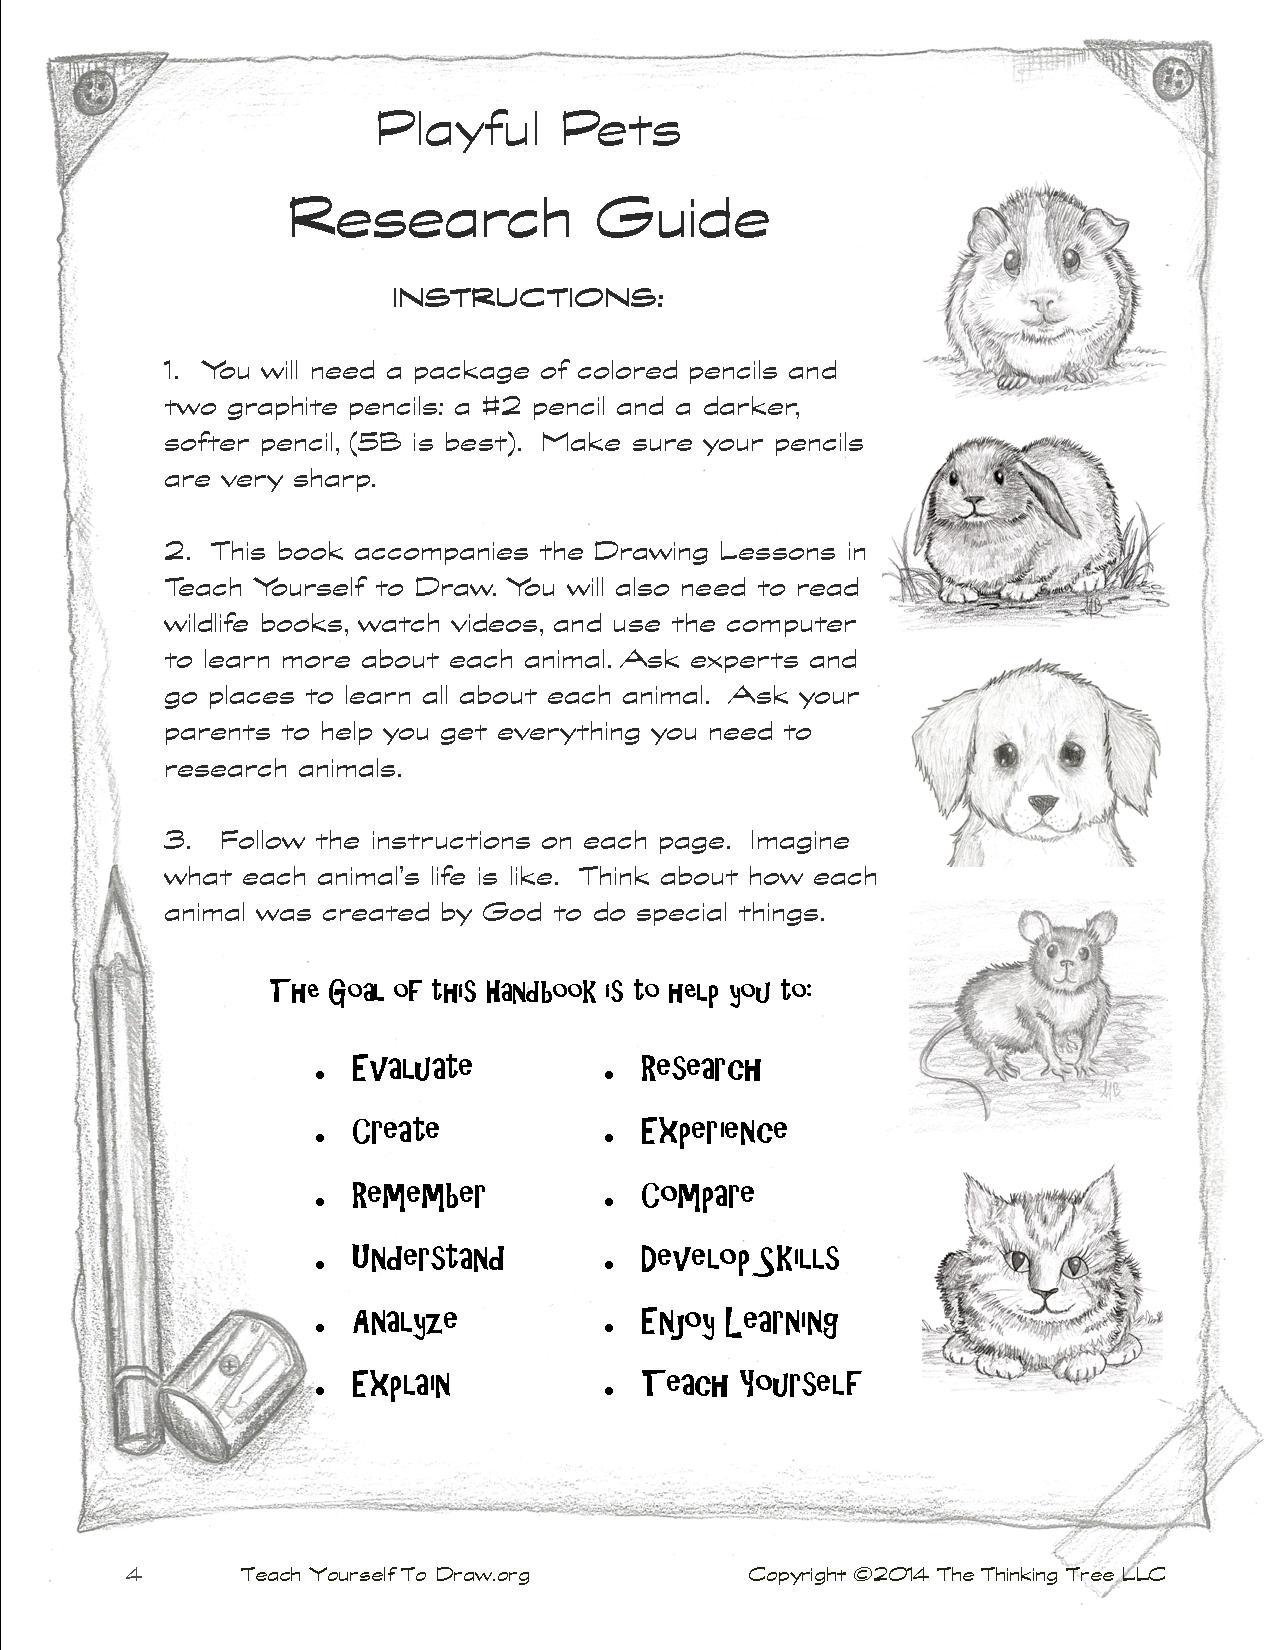 Playful Pets Page 4.jpg